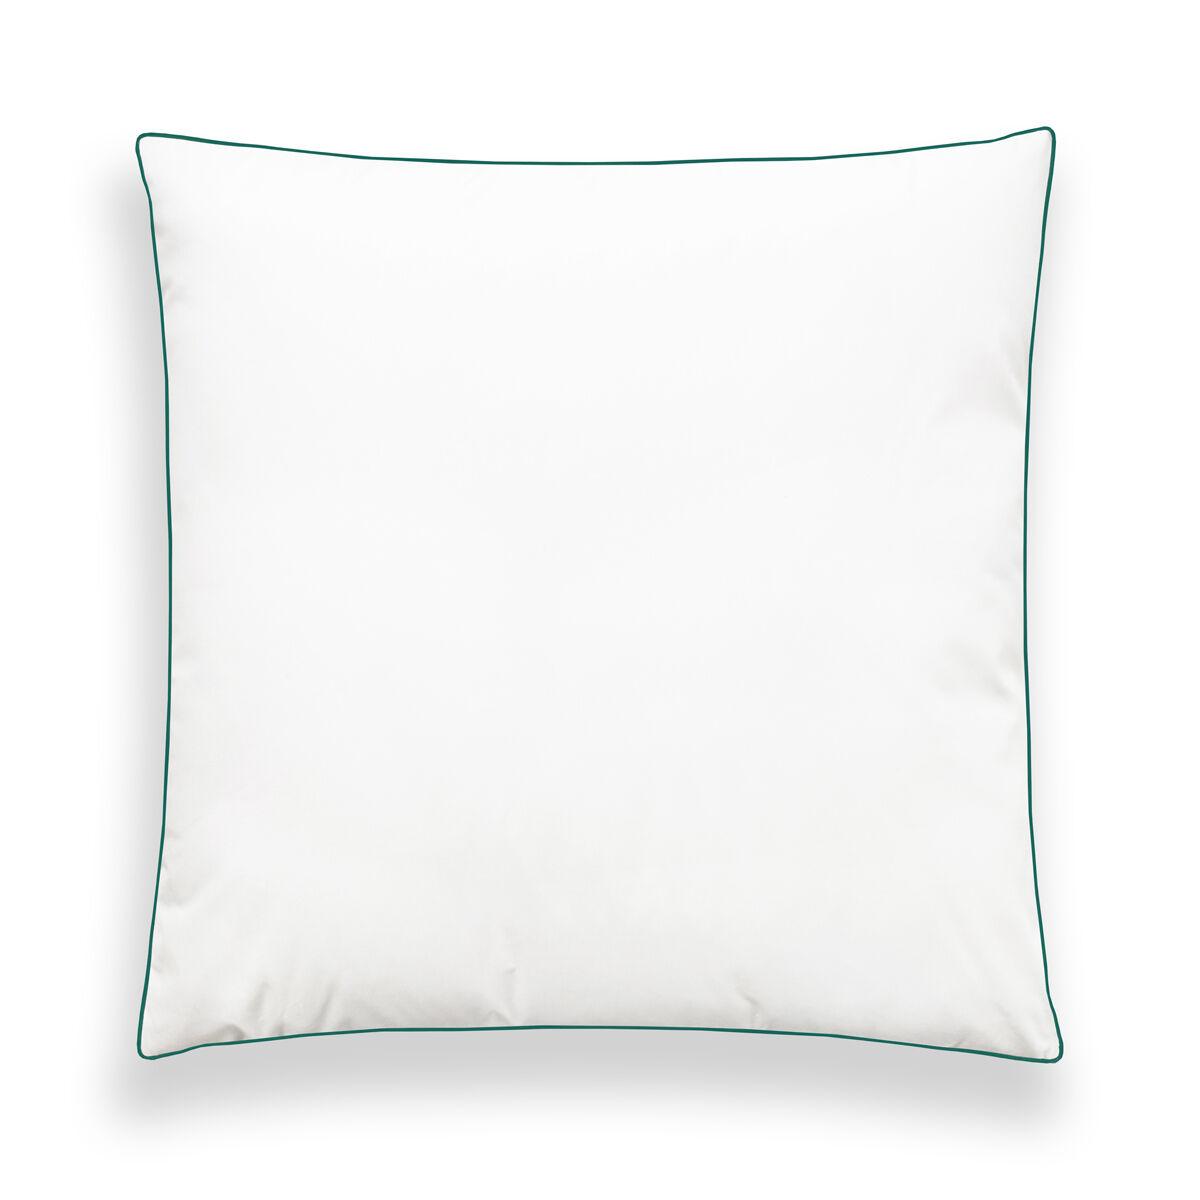 WAKE ME GREEN Oreiller MOELLEUX Respirant - Coton Bio  50x70 cm